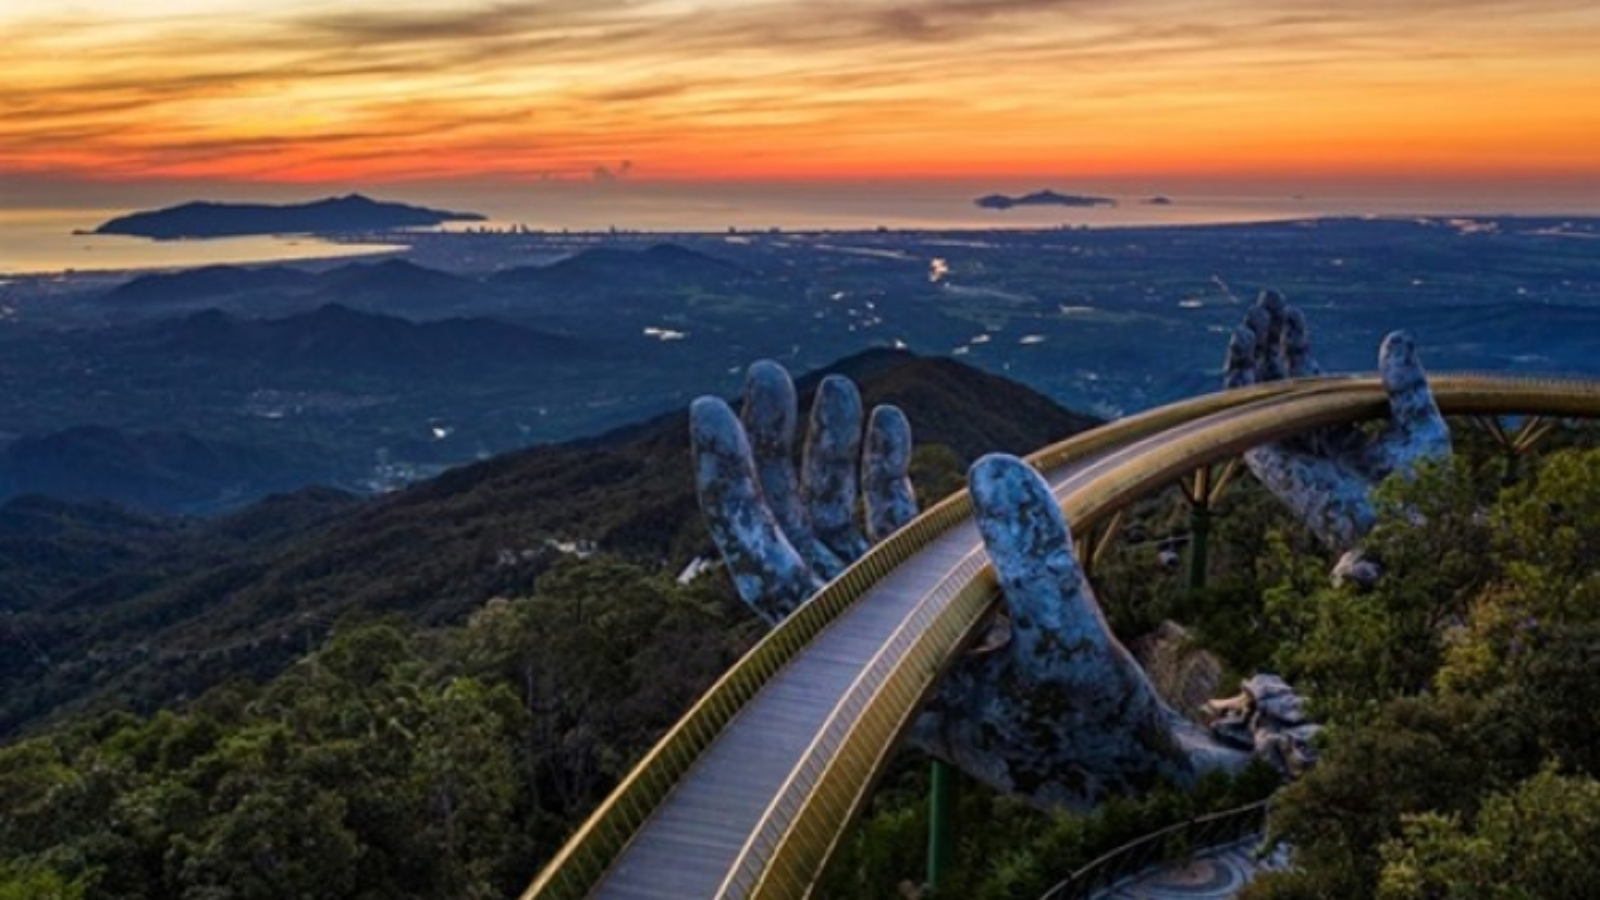 International awards boost Vietnam's tourism brand